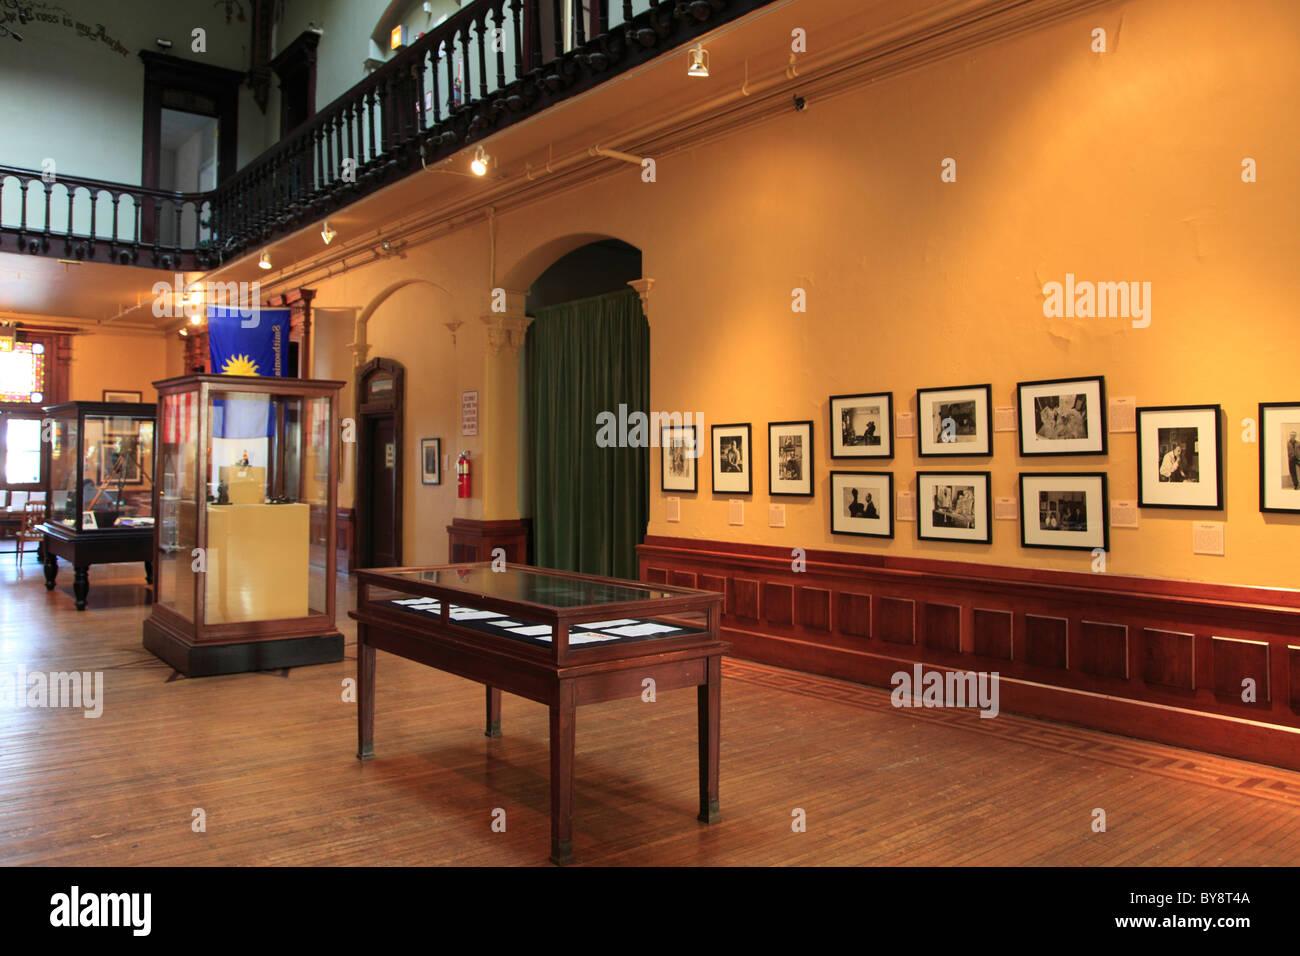 Main Hall, Snug Harbor Cultural Center And Botanical Garden, Richmond  Terrace, Staten Island, New York City